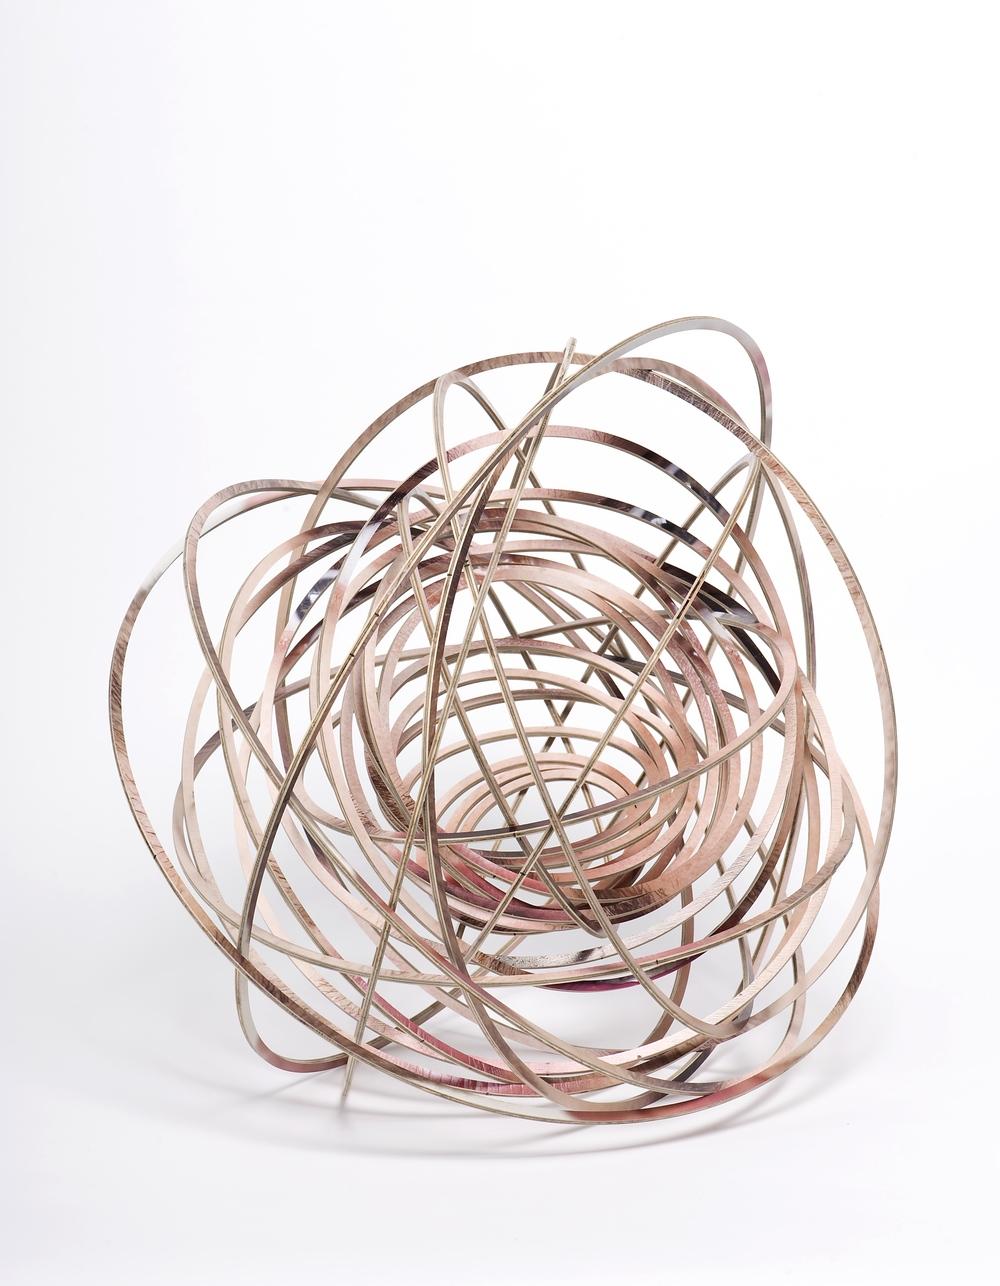 JUSTINE KHAMARA    orbital spin trick #1  2013 50 x 50 cm UV print, laser-cut plywood